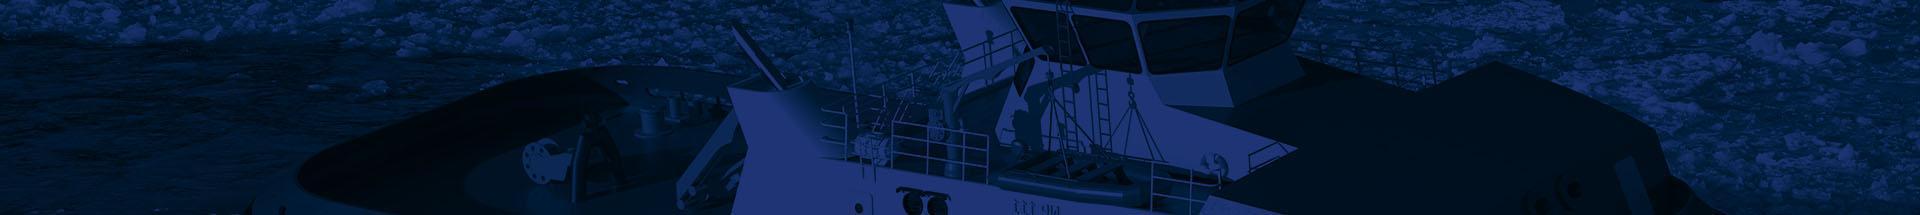 Tugs & workboats